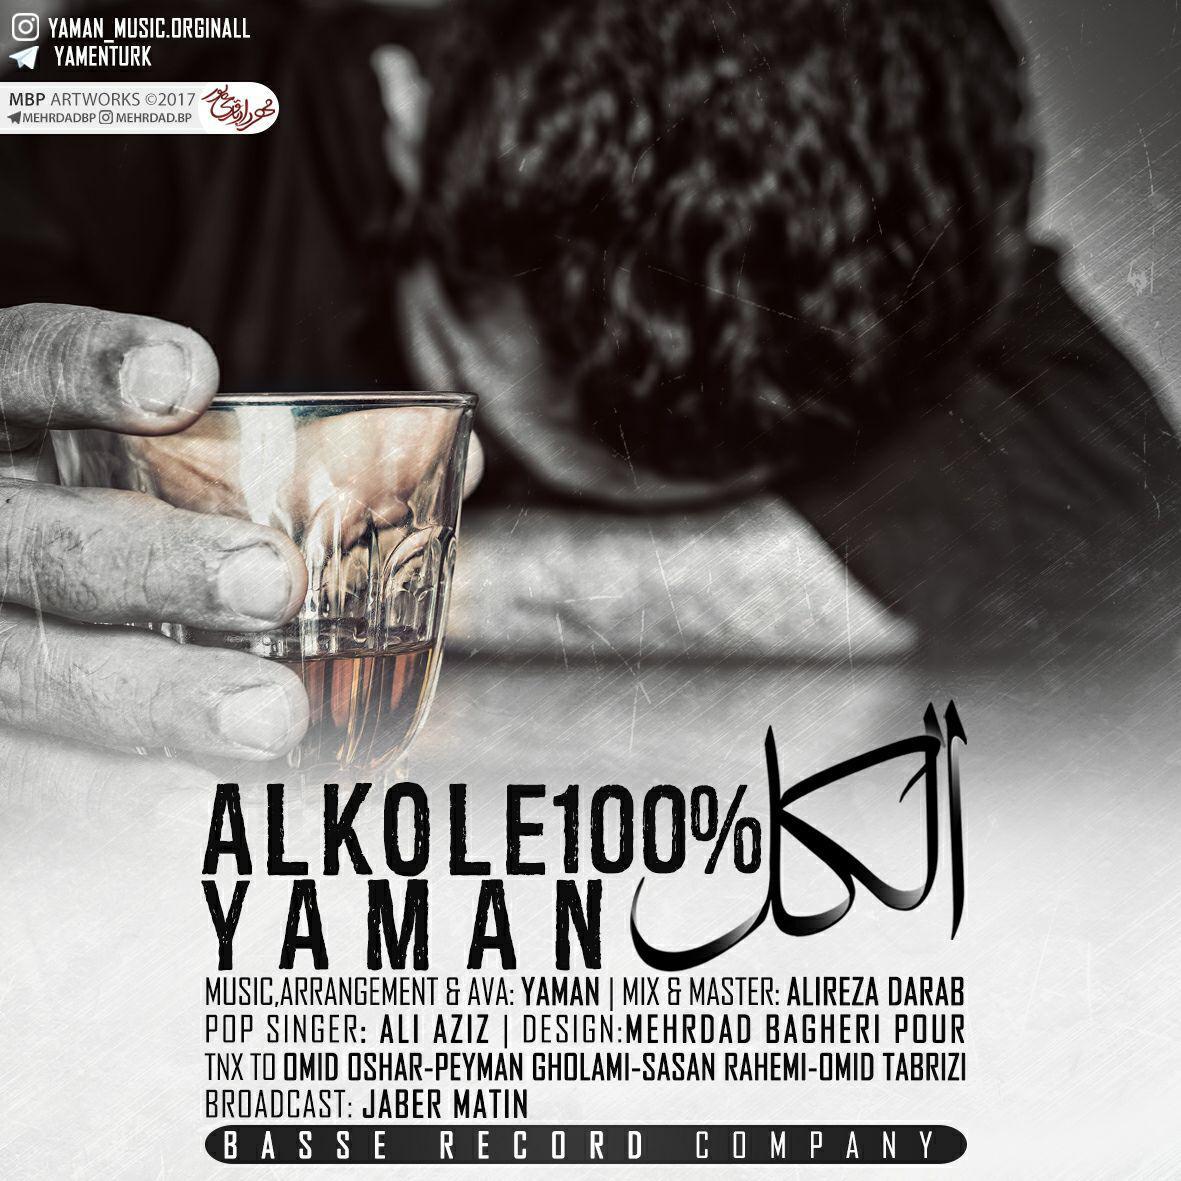 http://s9.picofile.com/file/8310597718/24YaMaN_Ft_Ali_jalili_Alkol_100_.jpg